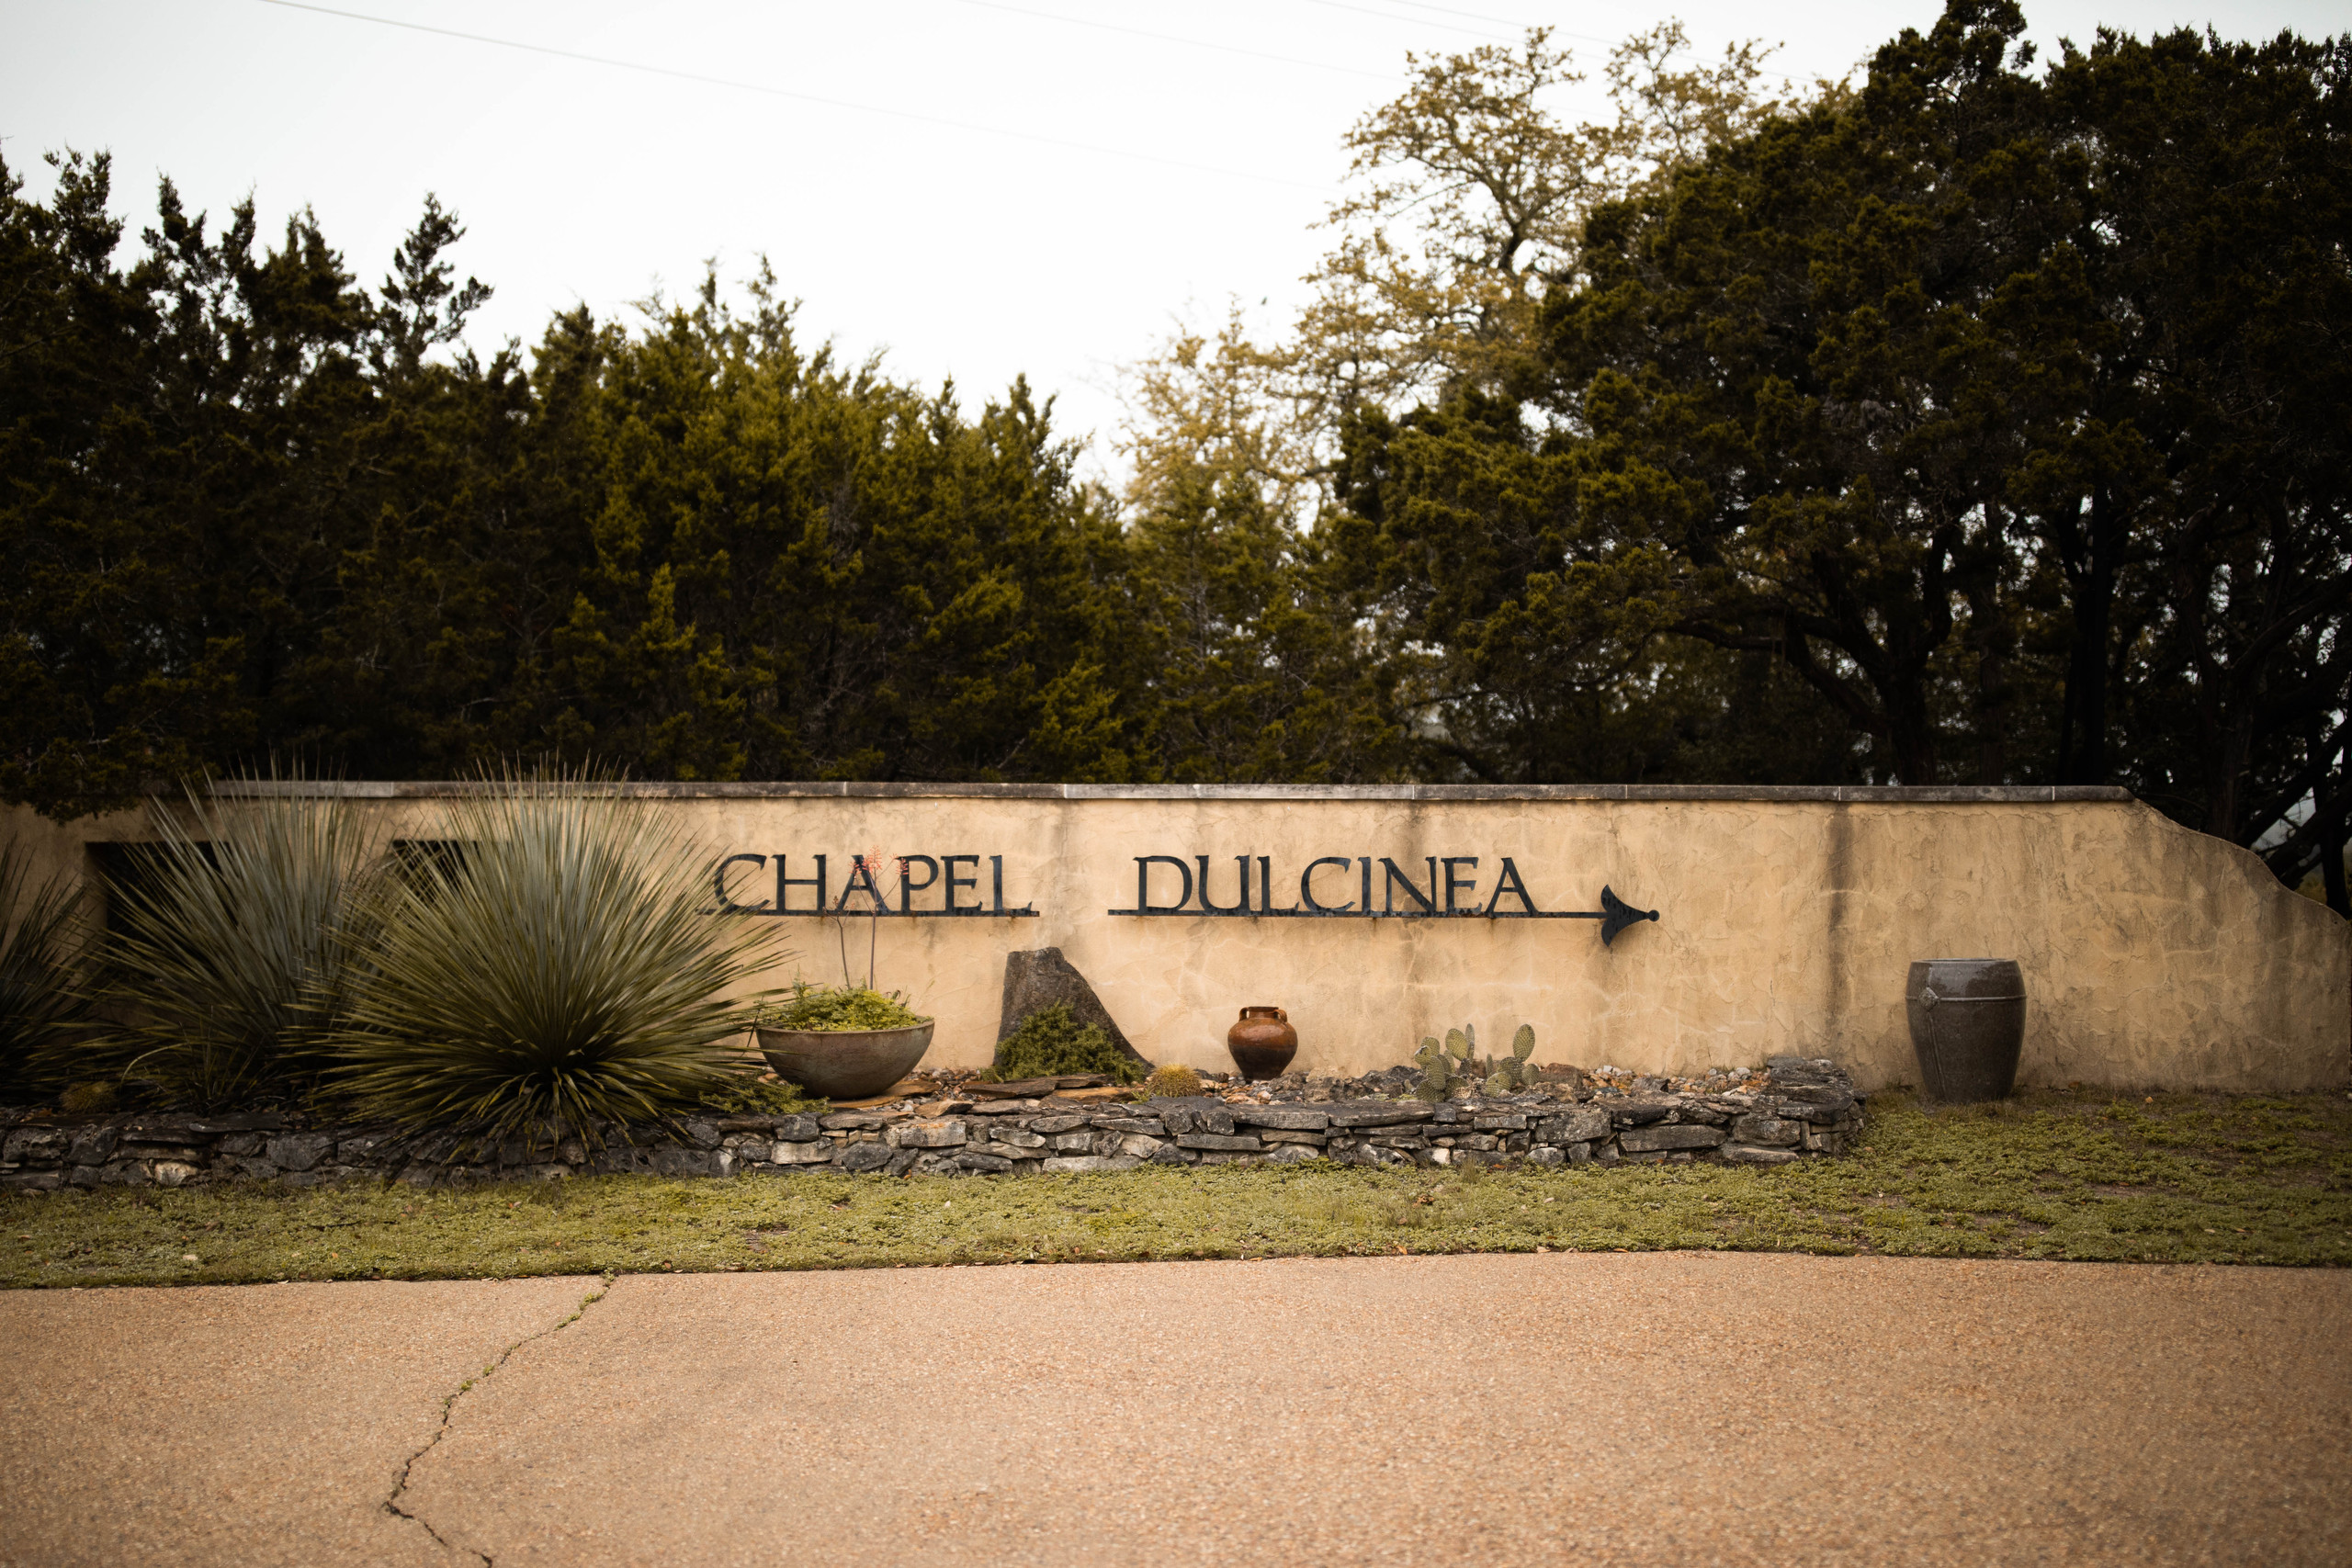 Chapel Dulcinea Sign